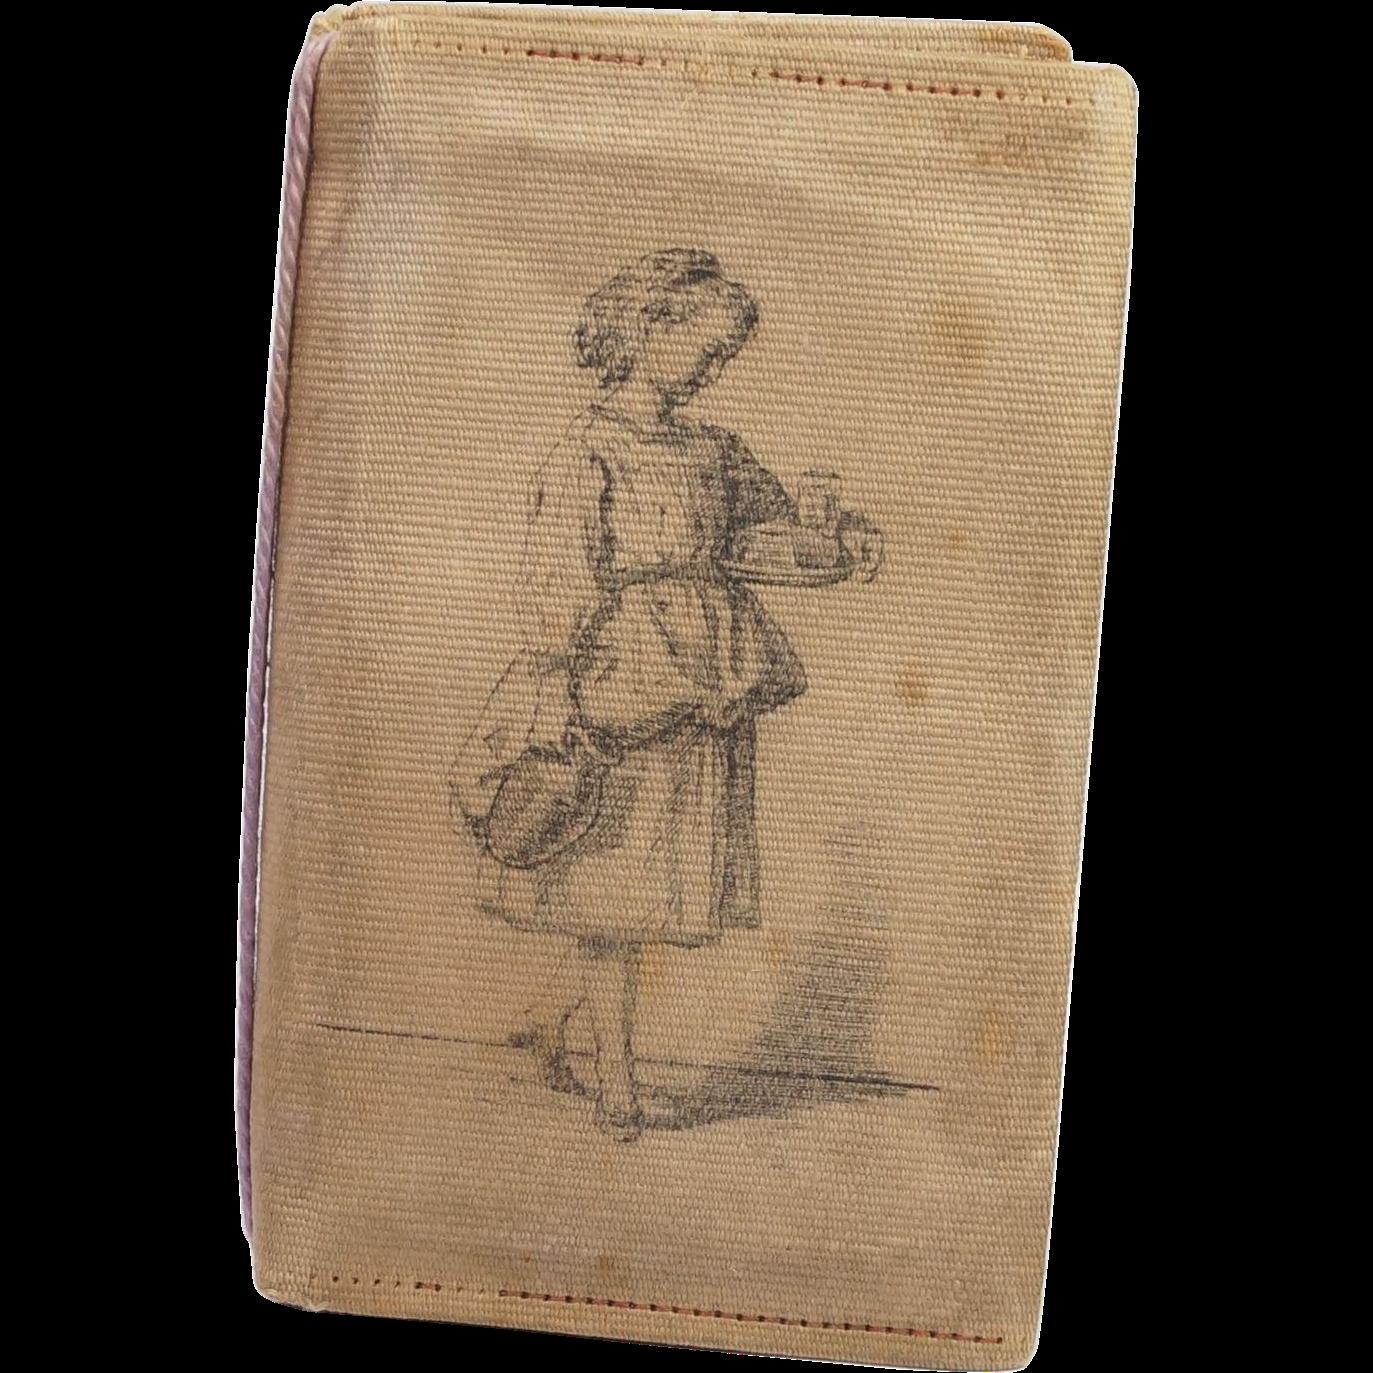 Antique 19th Century Victorian Aide Memoir Note Book Rare Printed Cover English Circa 1880